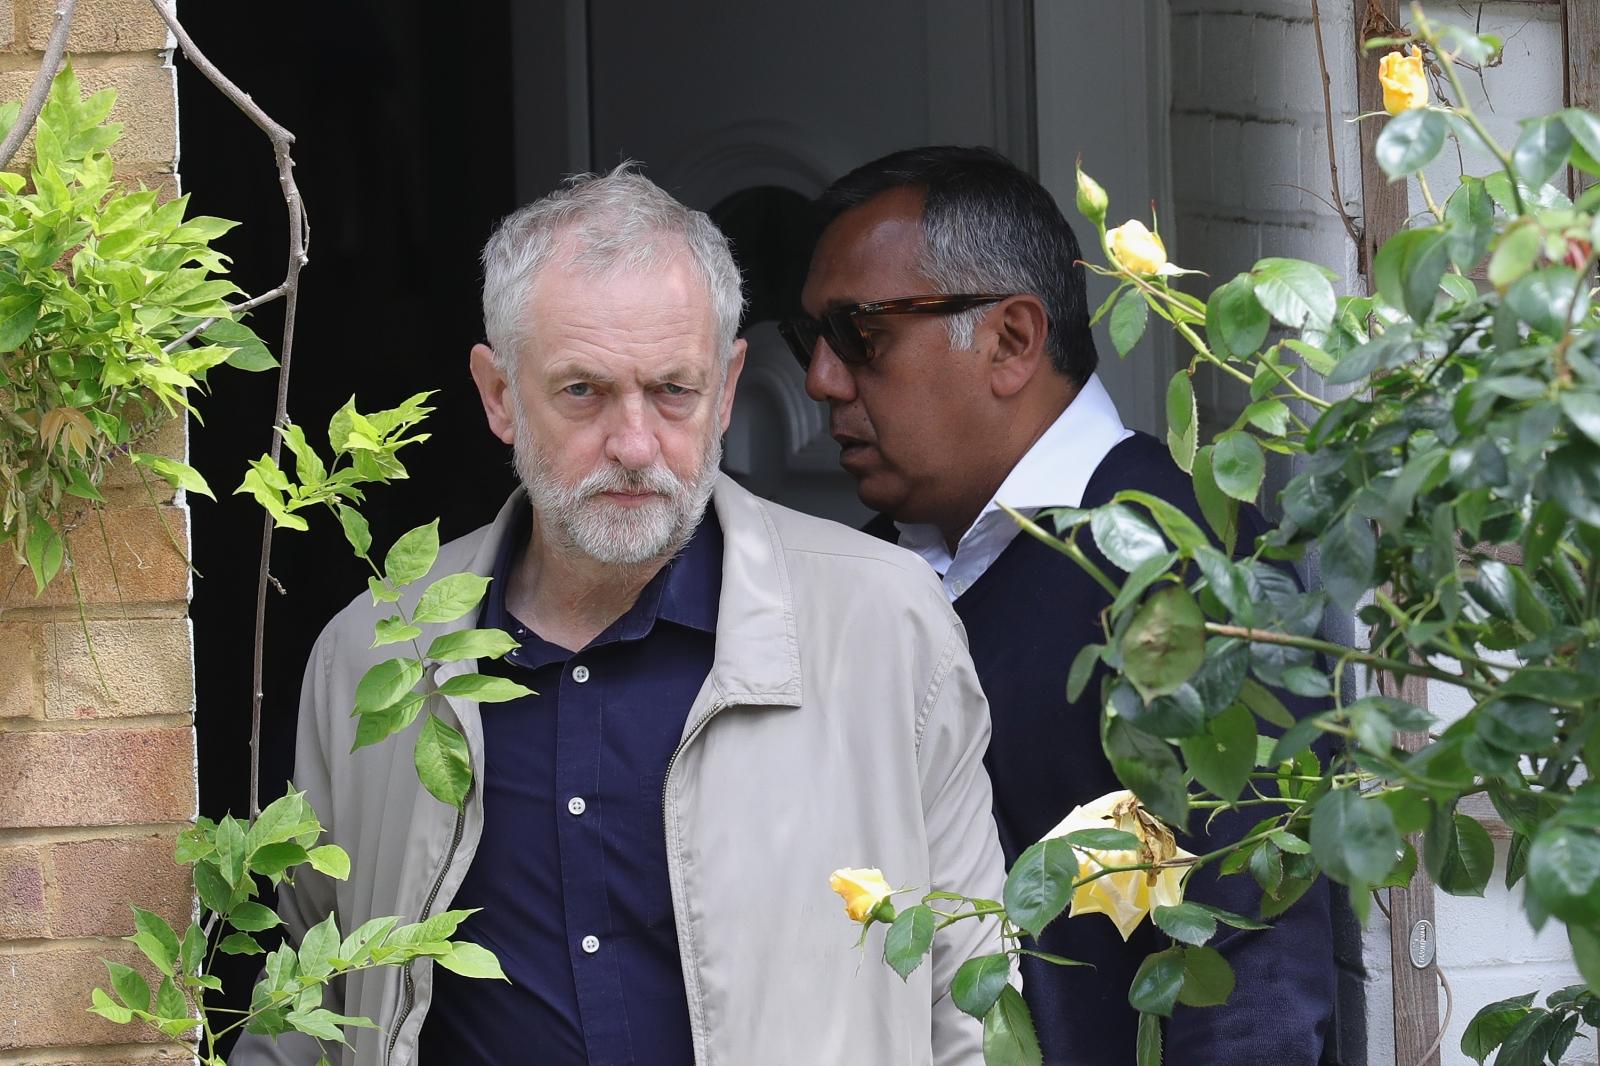 Corbyn outside his front door